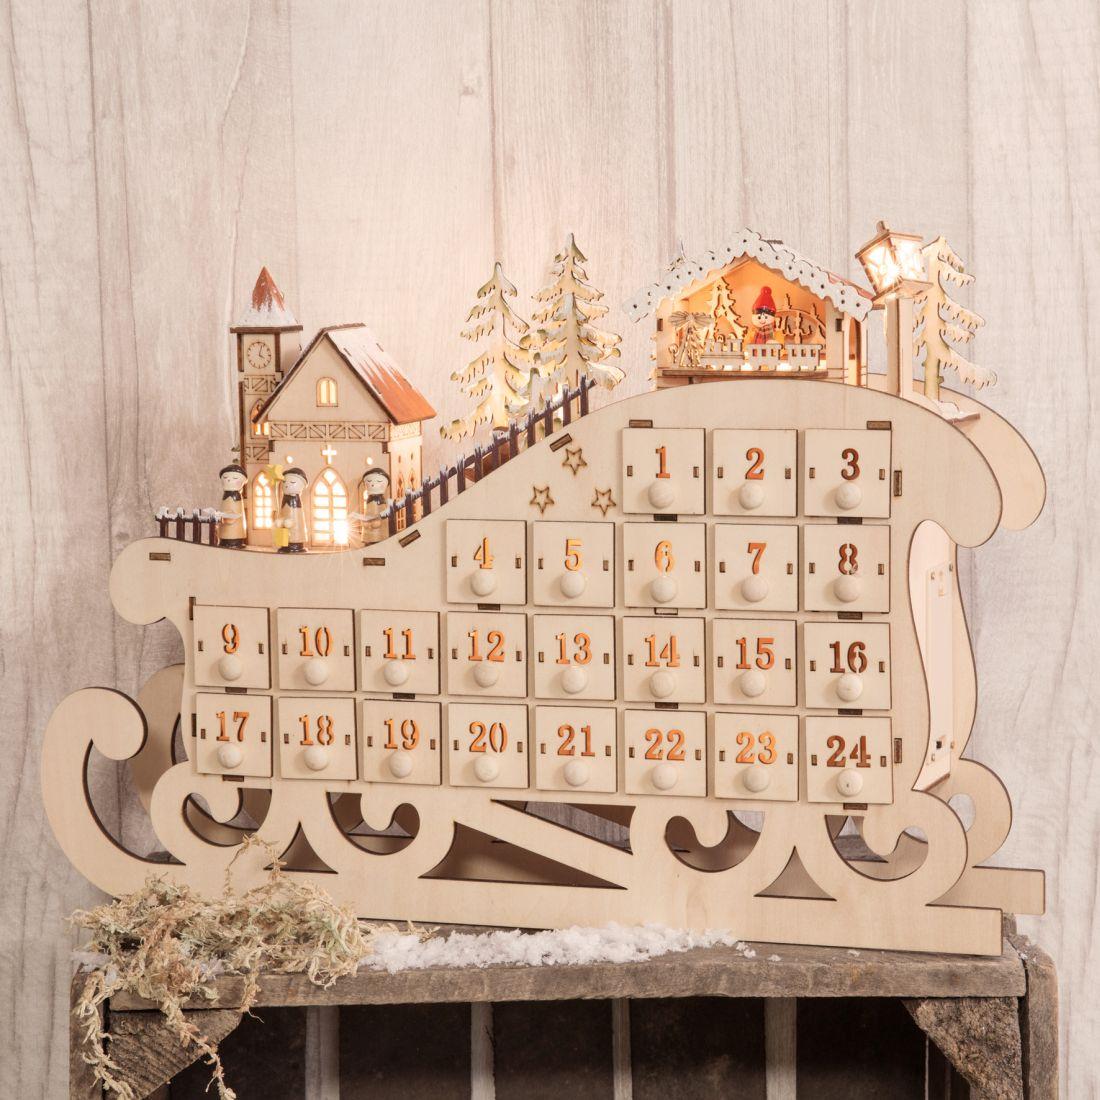 5post-bananas-gifts_natural-wood-christmas-advent-calendar-light-up-village-scene-decorationornament.jpg